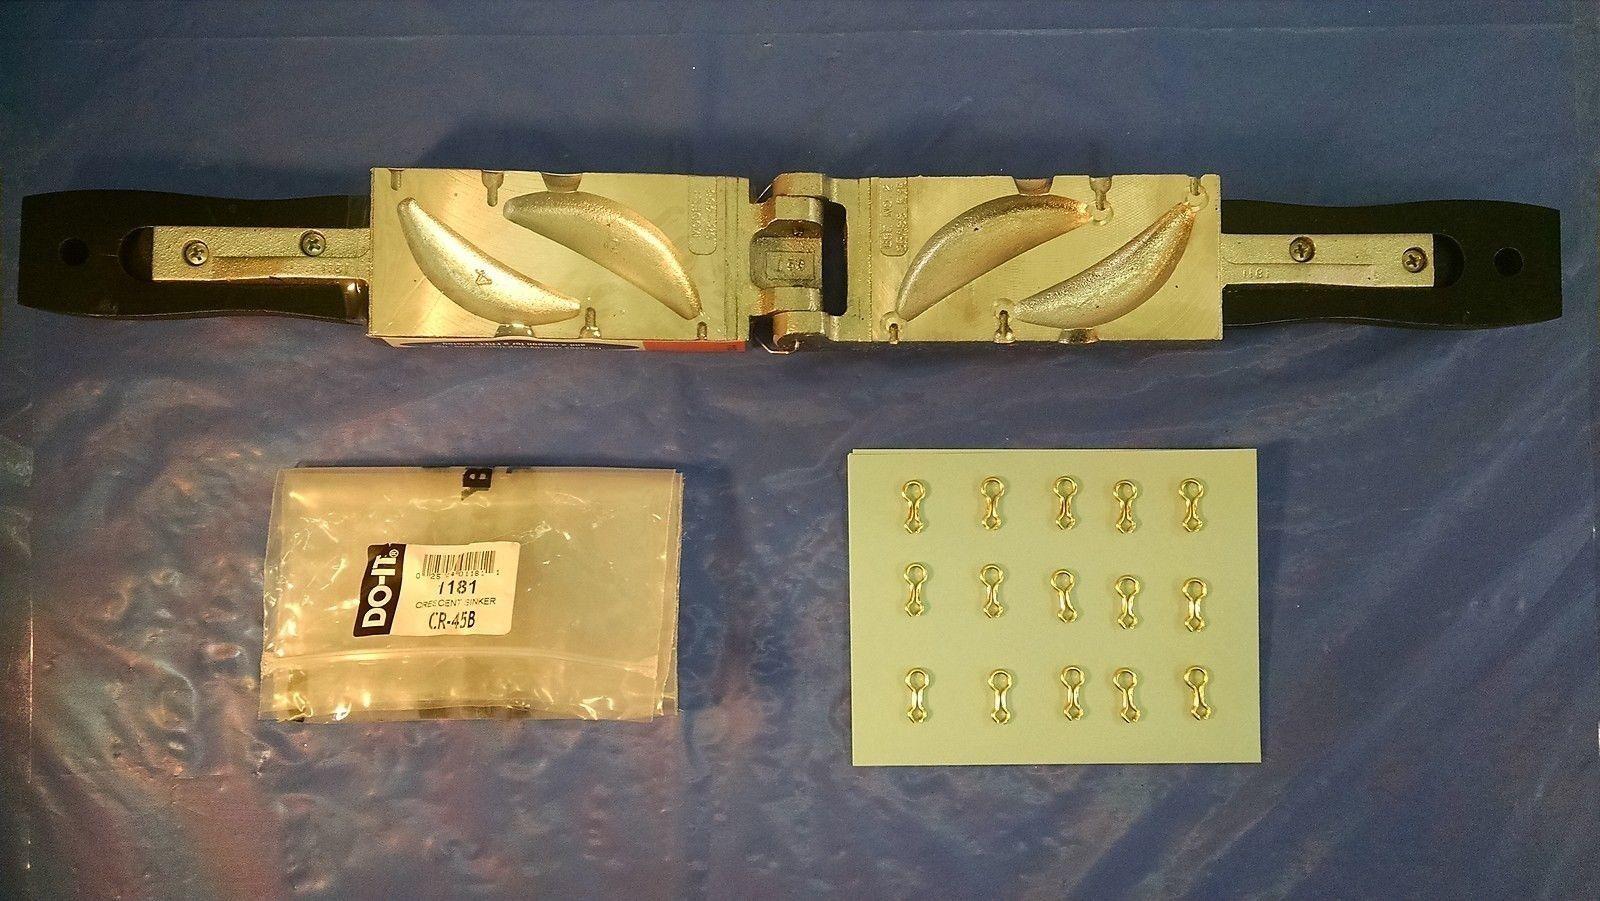 1182 NEW DO-IT SINKER MOLD CRESCENT SIZE 6 oz., CR-6-B, w 15 pcs. eyes